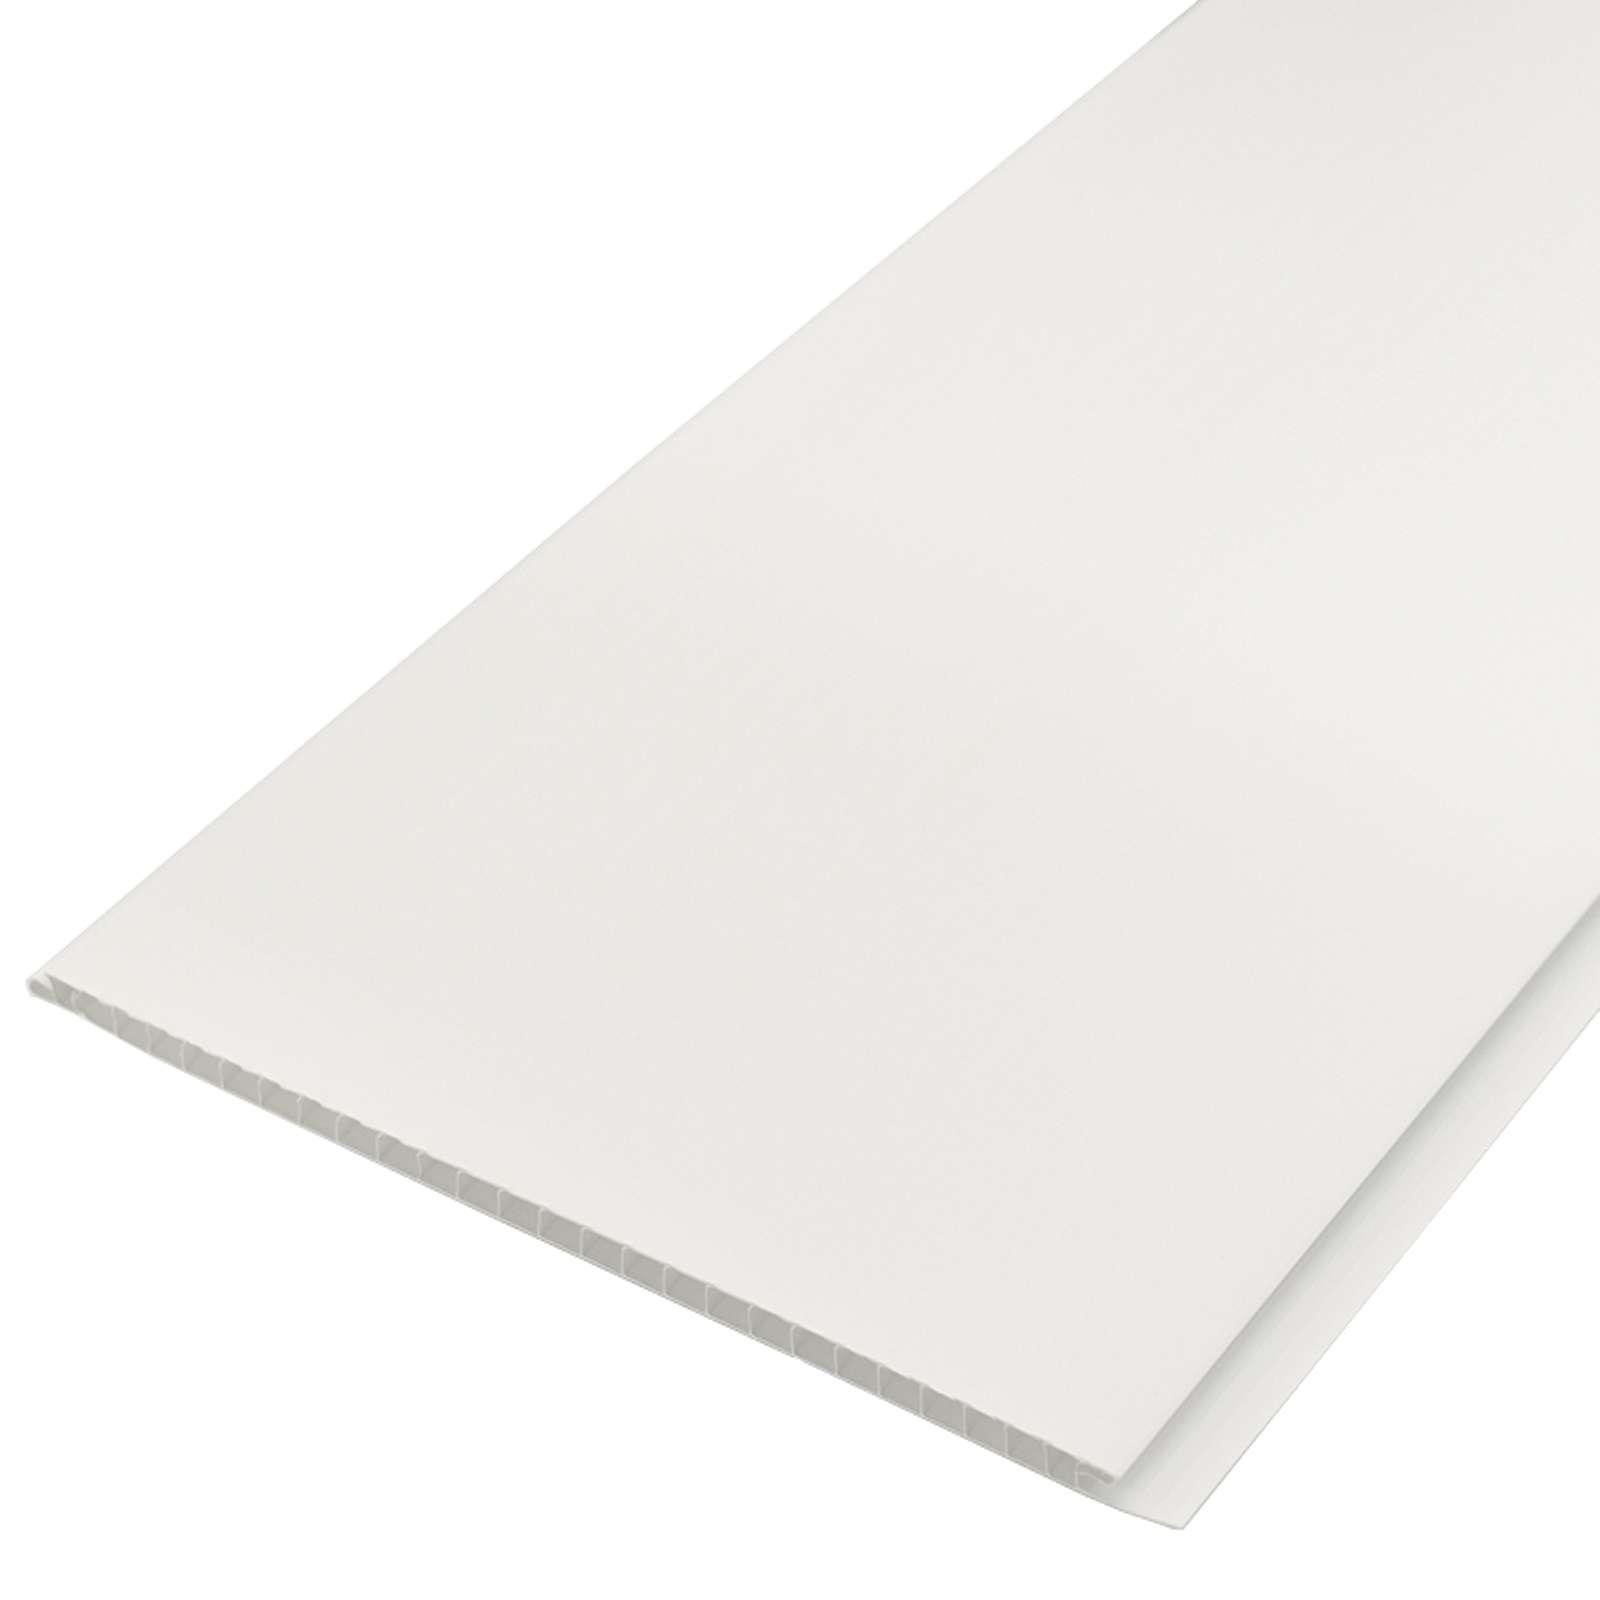 Панель П-25 белая матовая, 2,7м